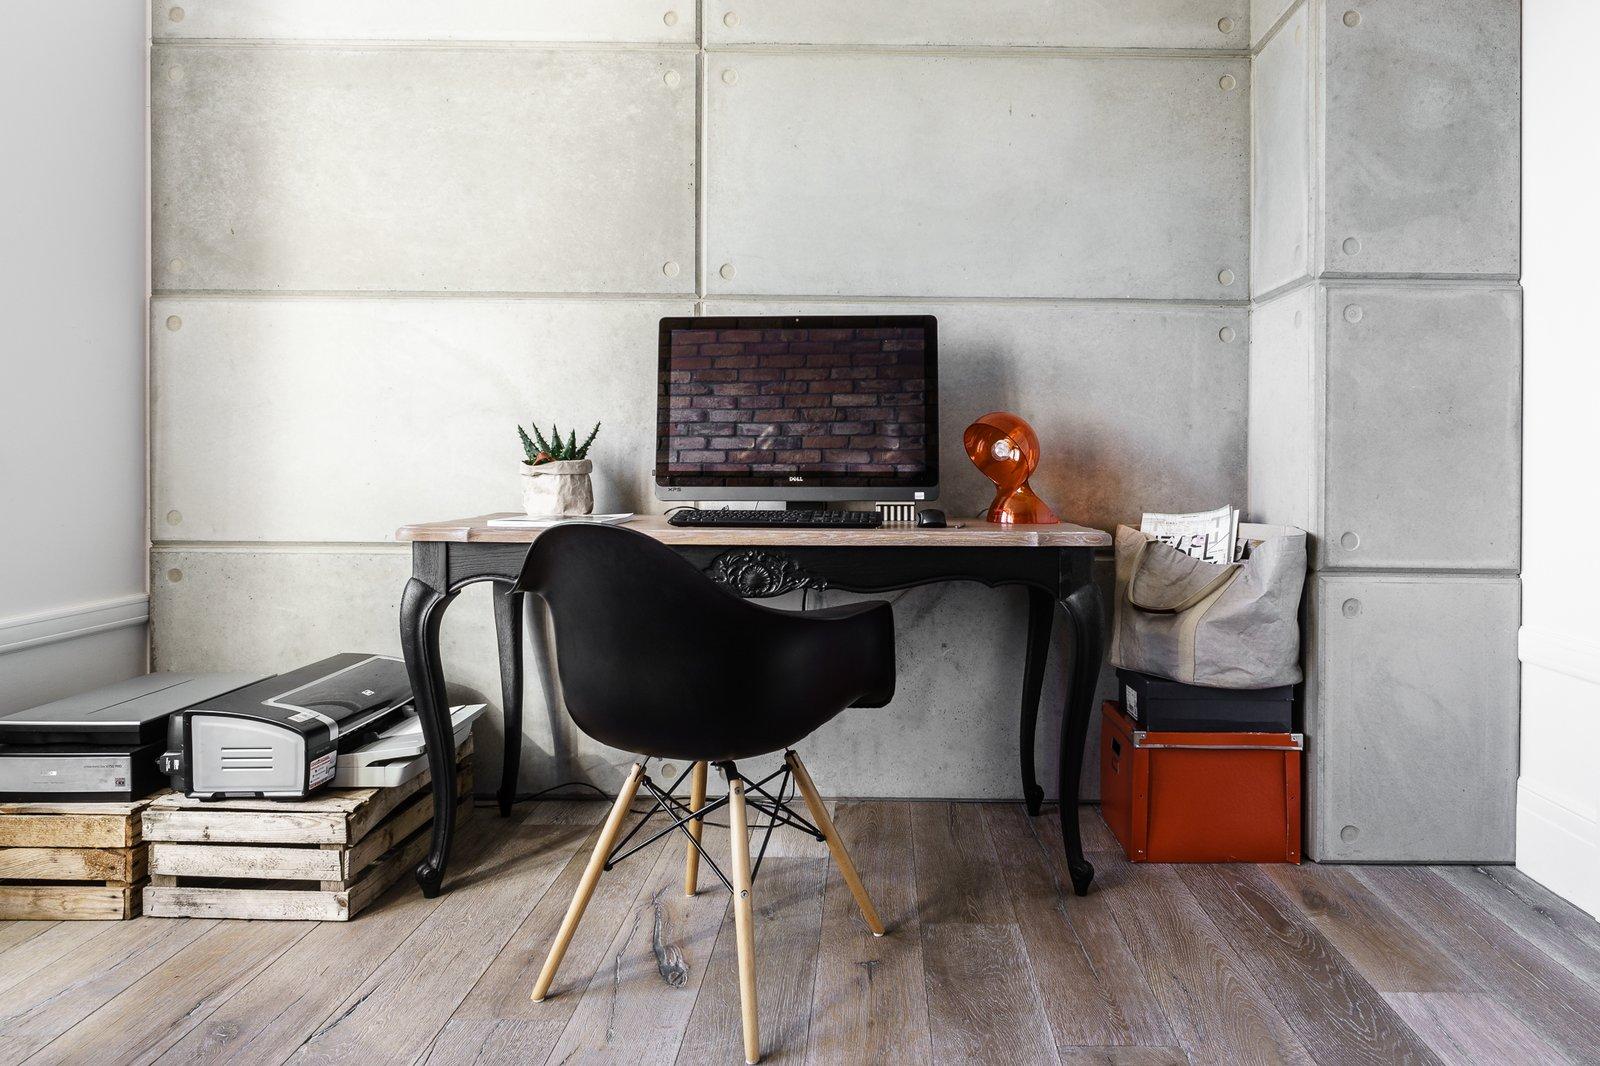 Office, Desk, Chair, Study Room Type, and Medium Hardwood Floor  Loft in Poland